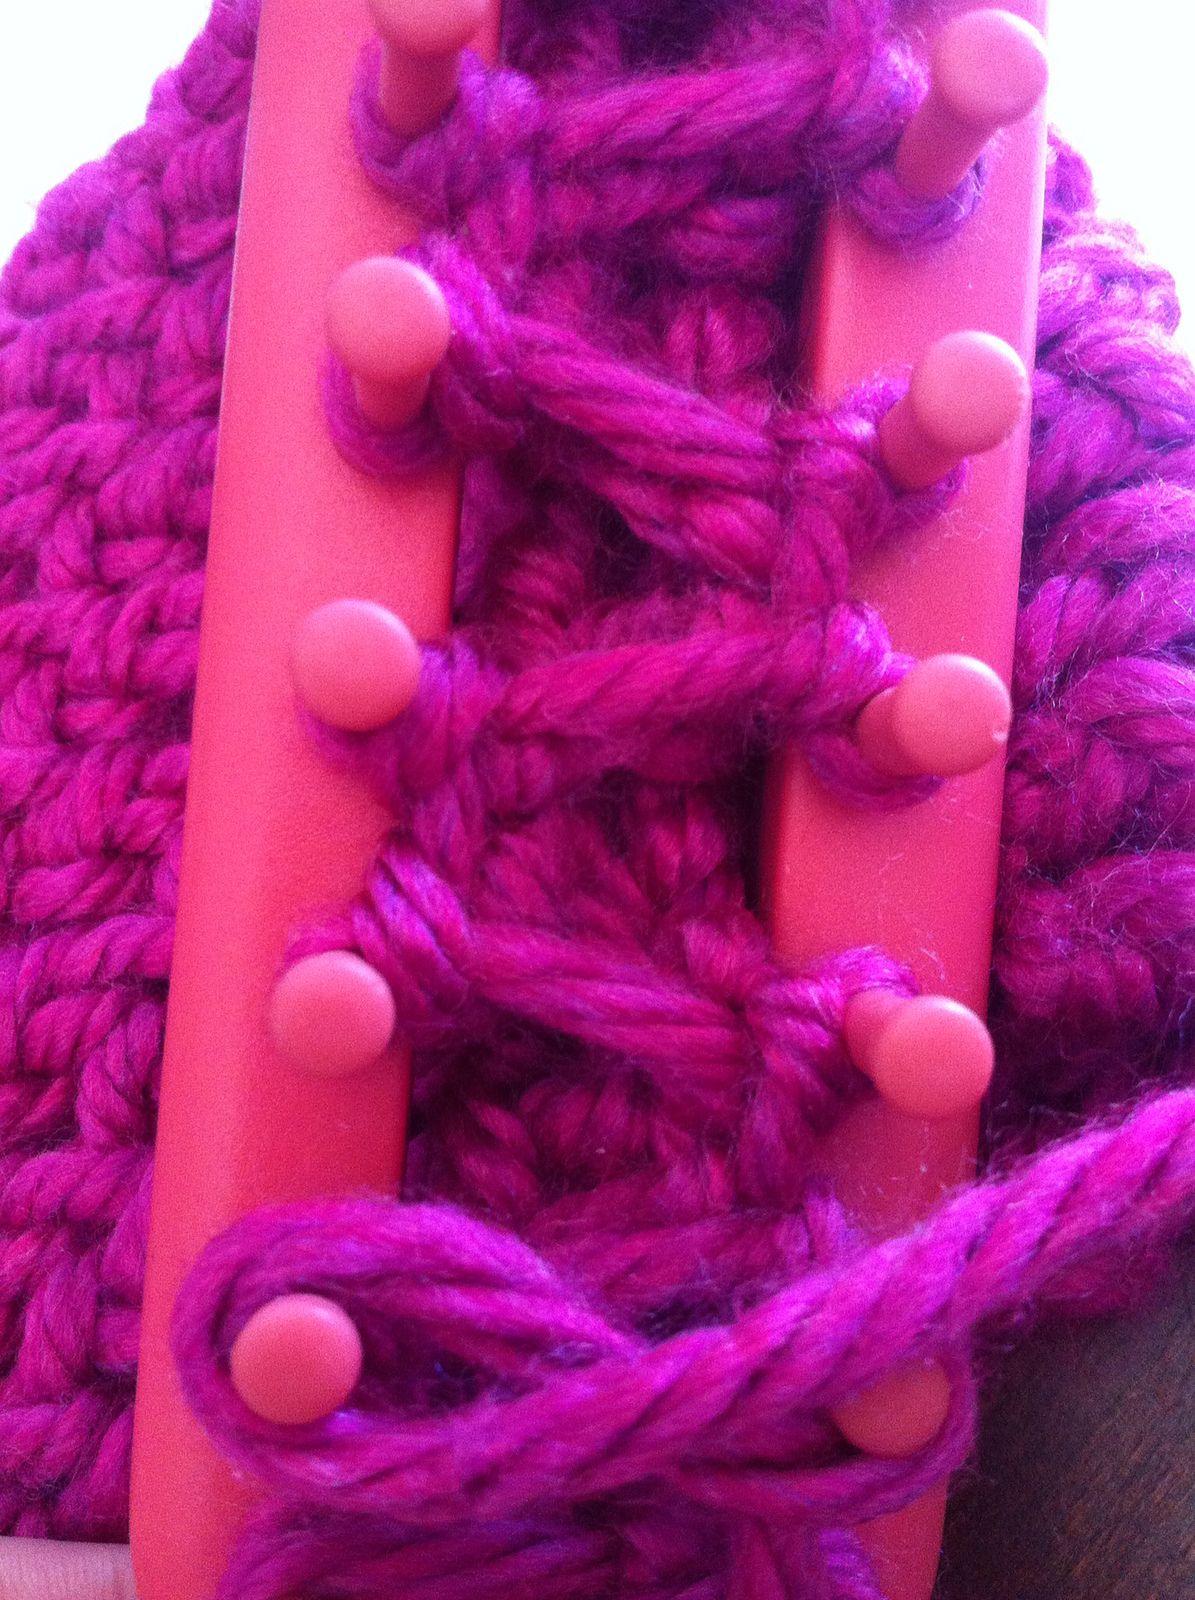 Loom Knitting: Braid Knit stitch | Loom knitting, Loom ...